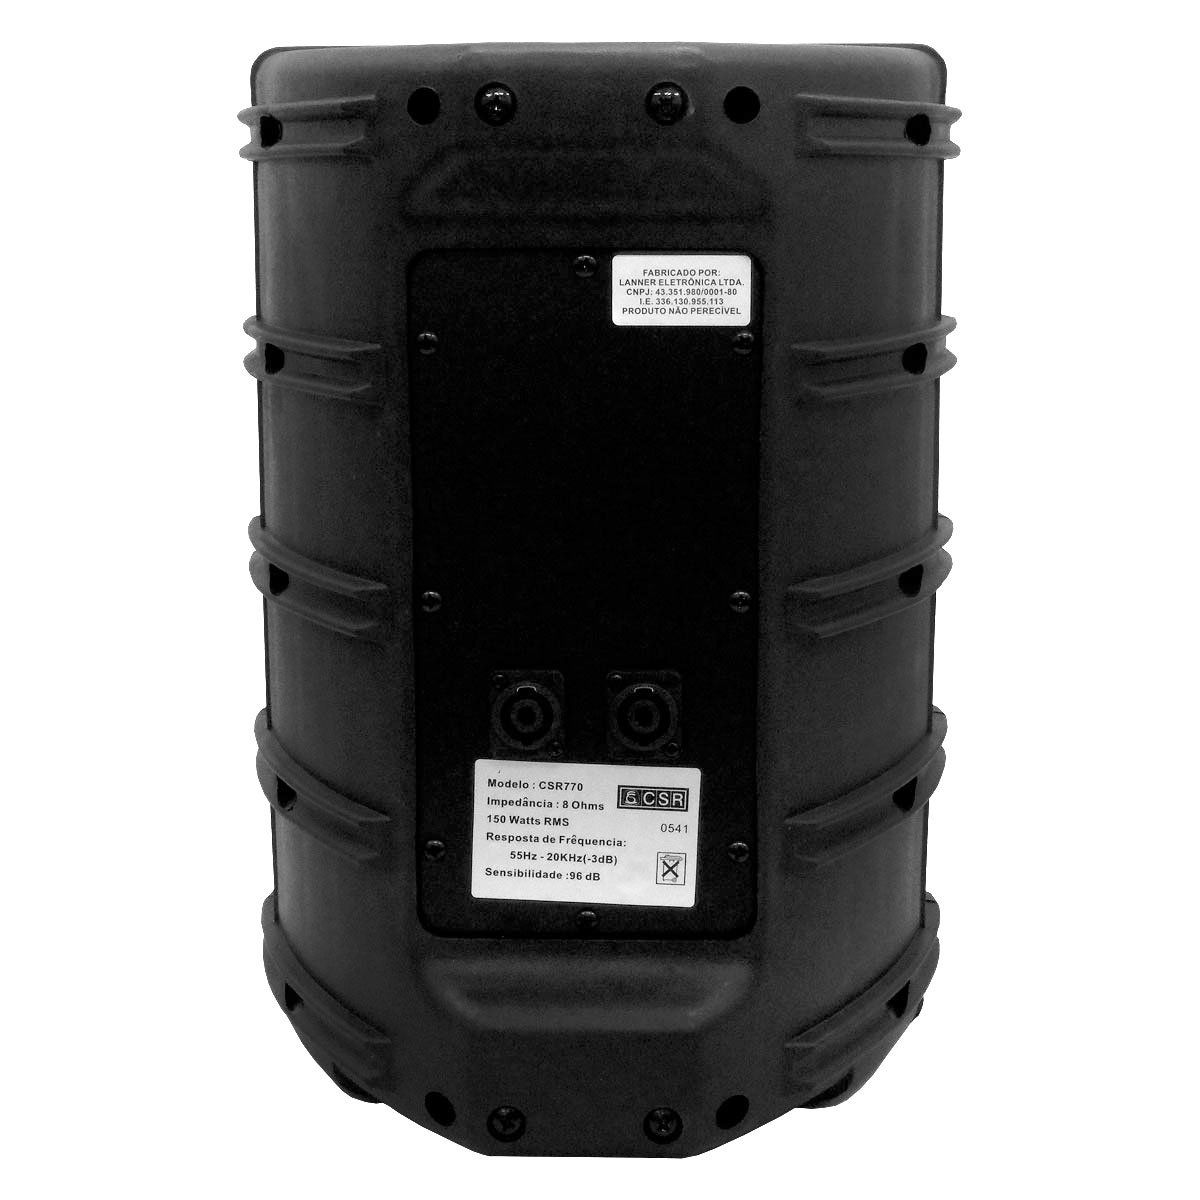 Caixa Passiva Fal 8 Pol 150W - CSR 770